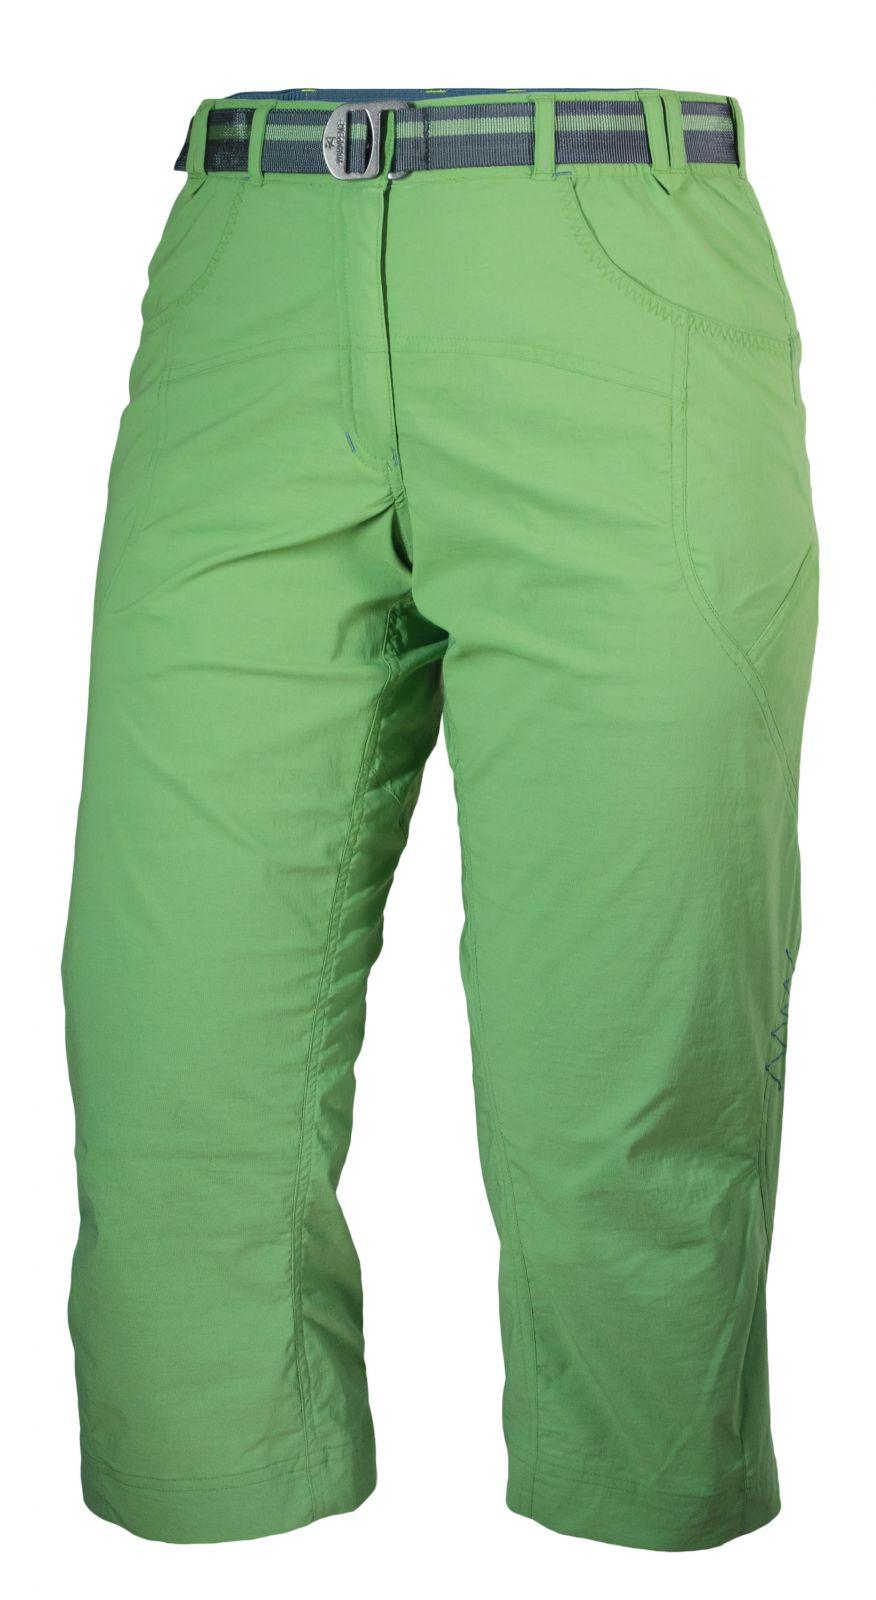 Warmpeace Flex 3/4 Lady Grass dámské kalhoty